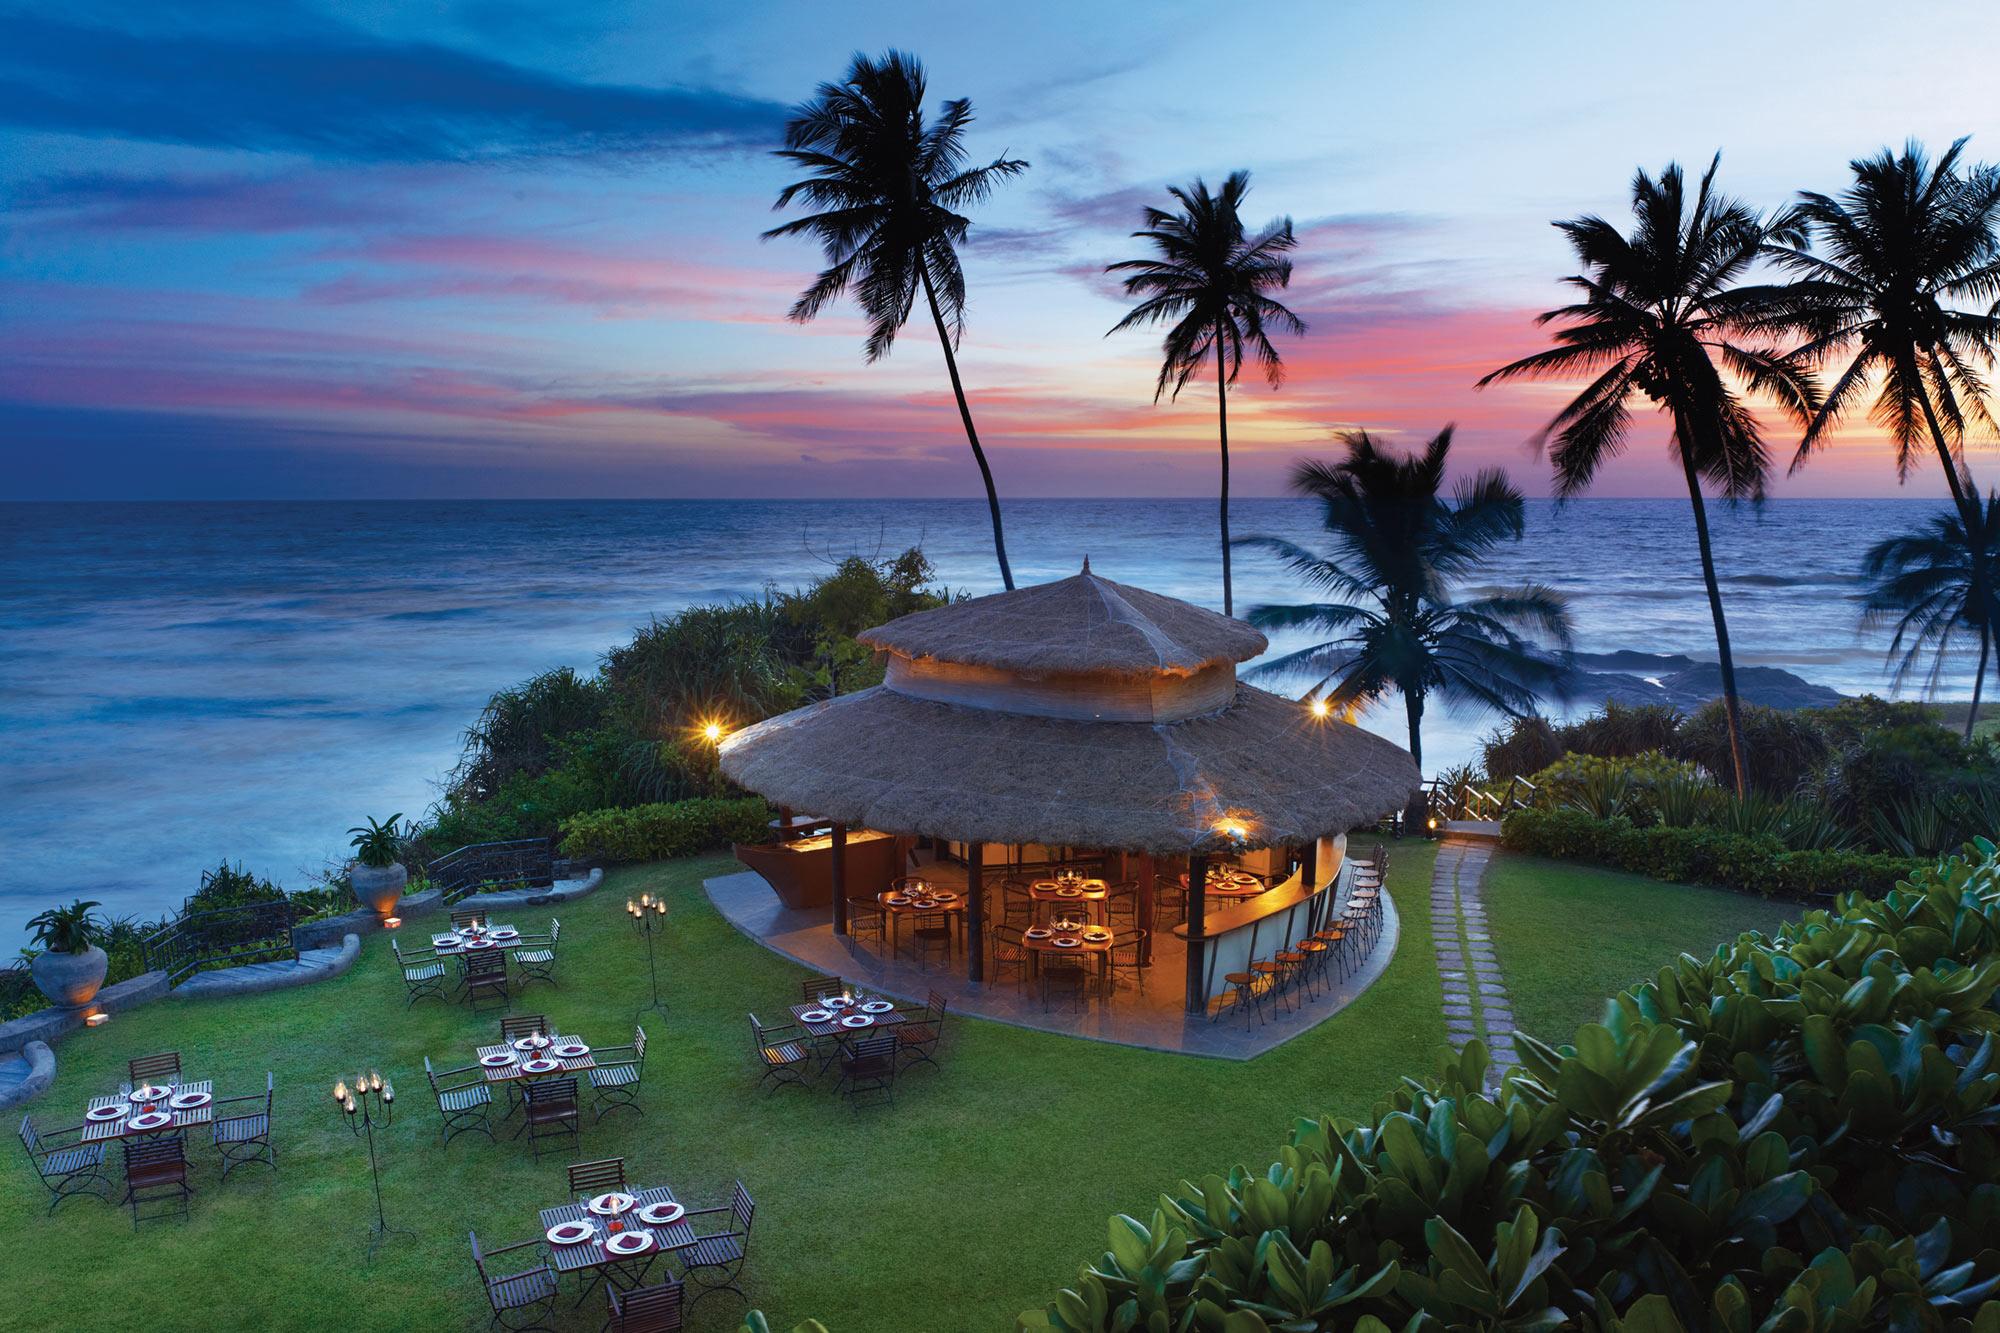 Luxury Sri Lanka Beach Holidays